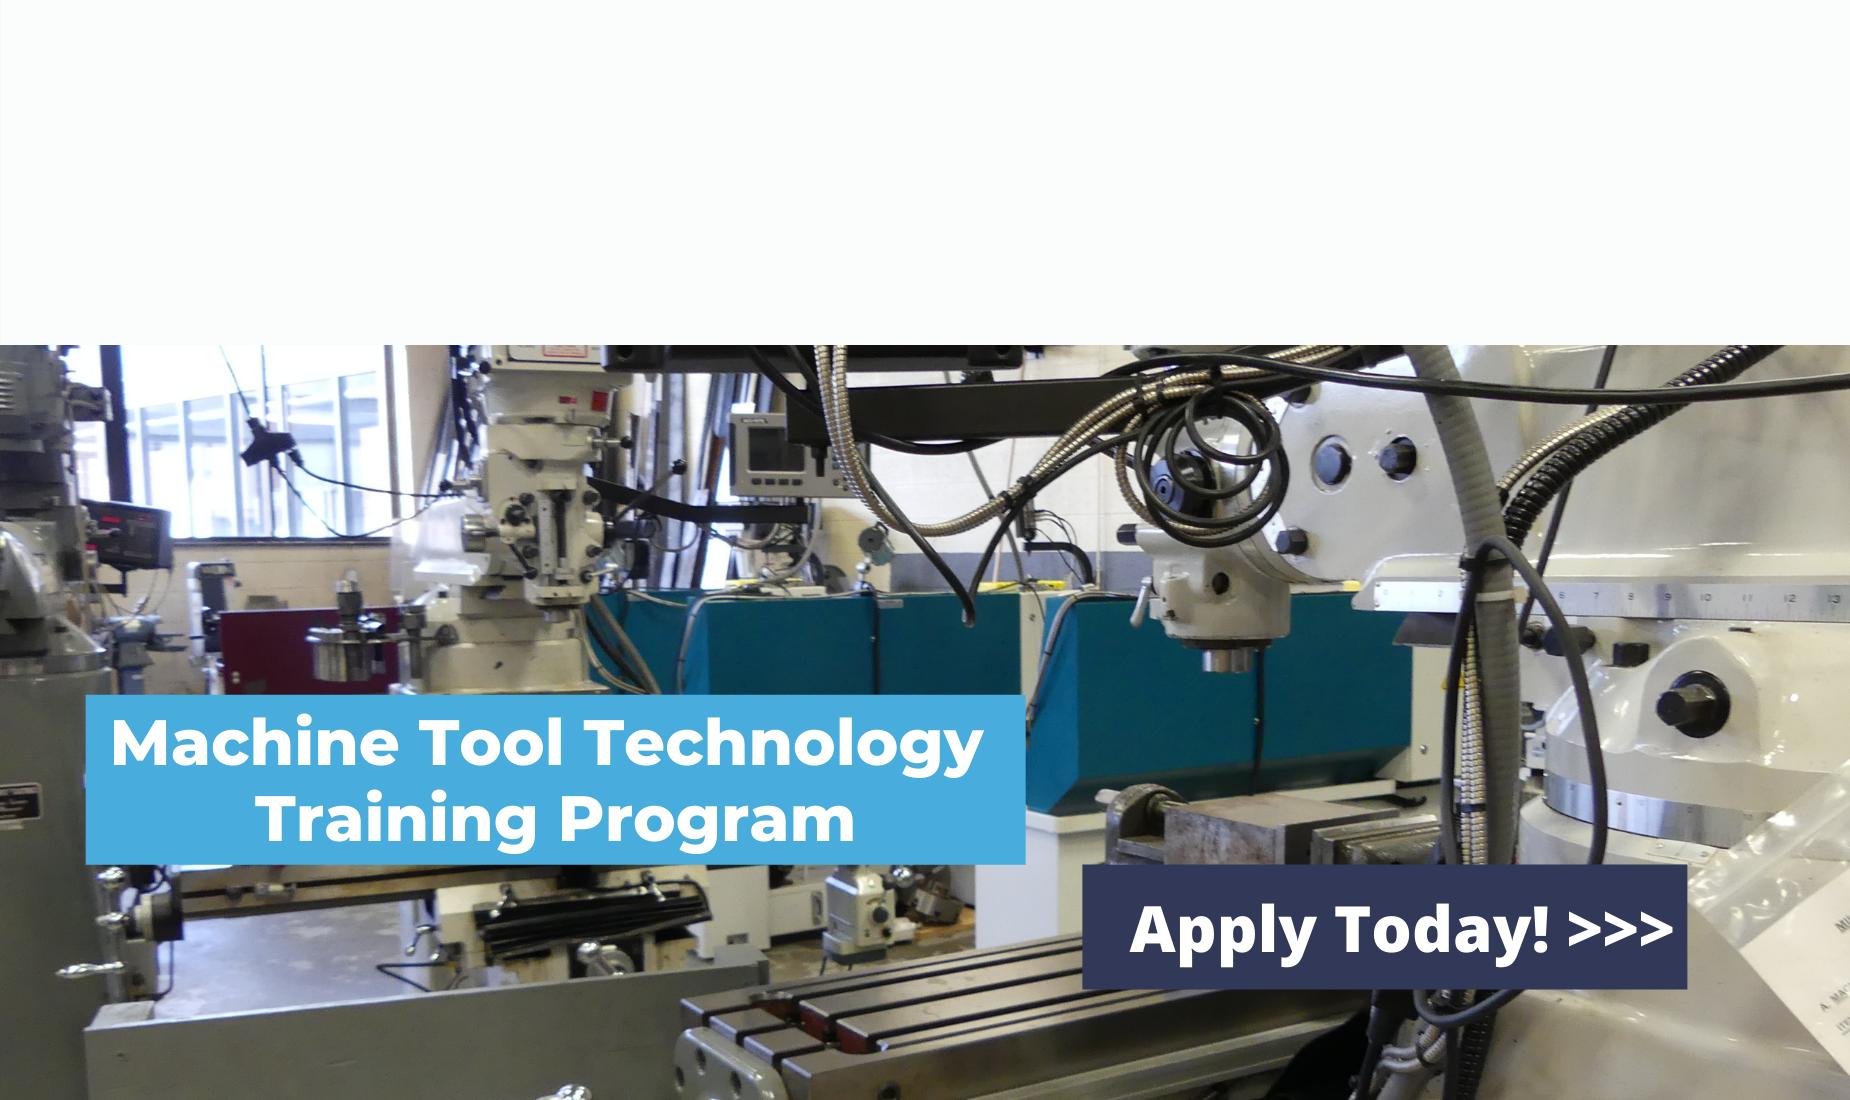 Machine Tool Tech Training Program